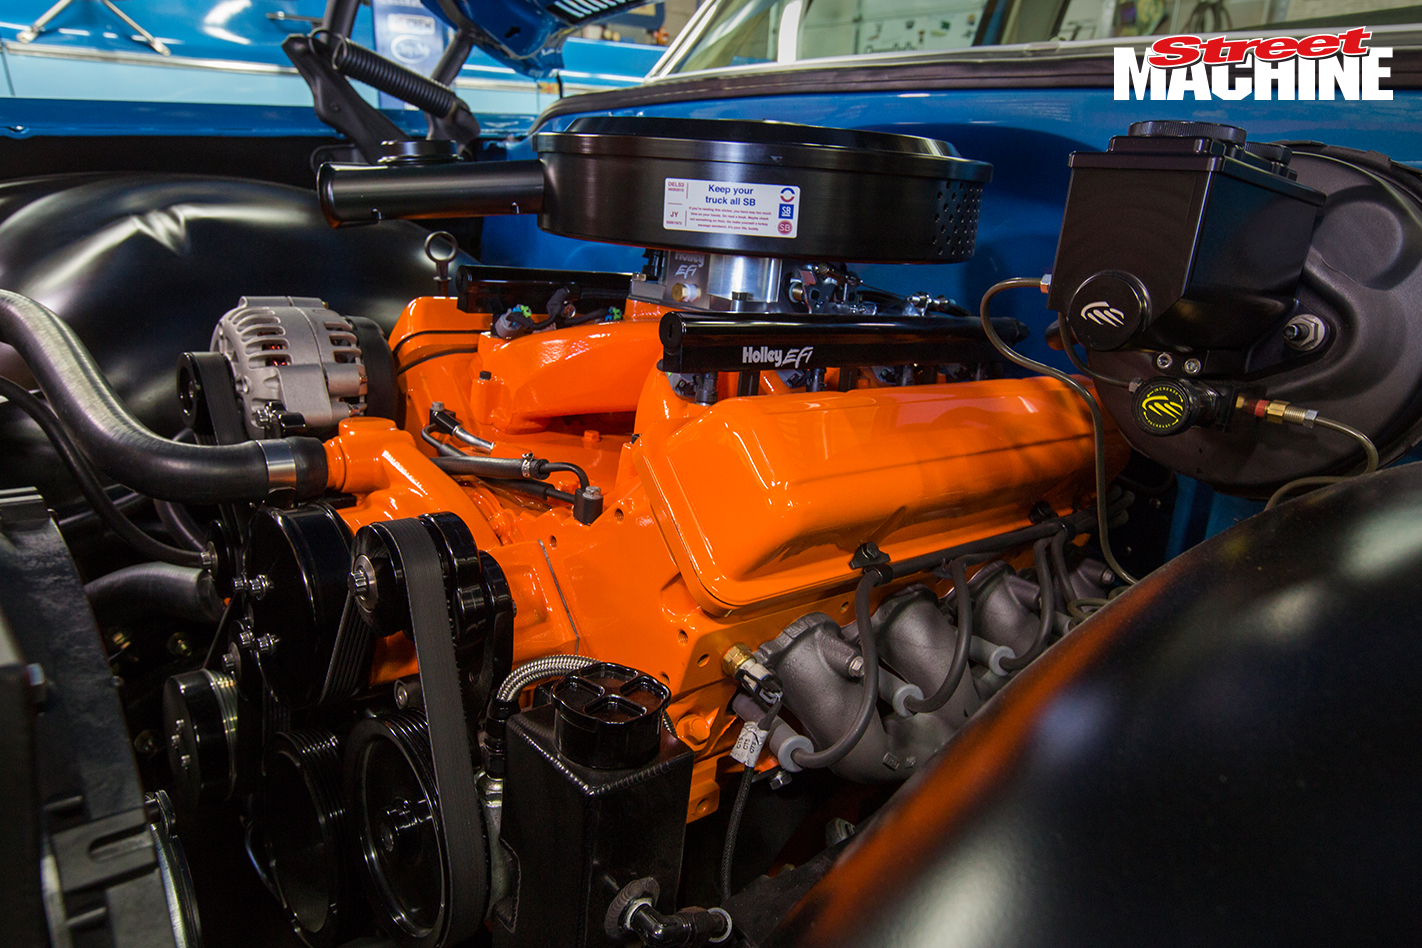 Chev C10 Slammed Engine LS3 1